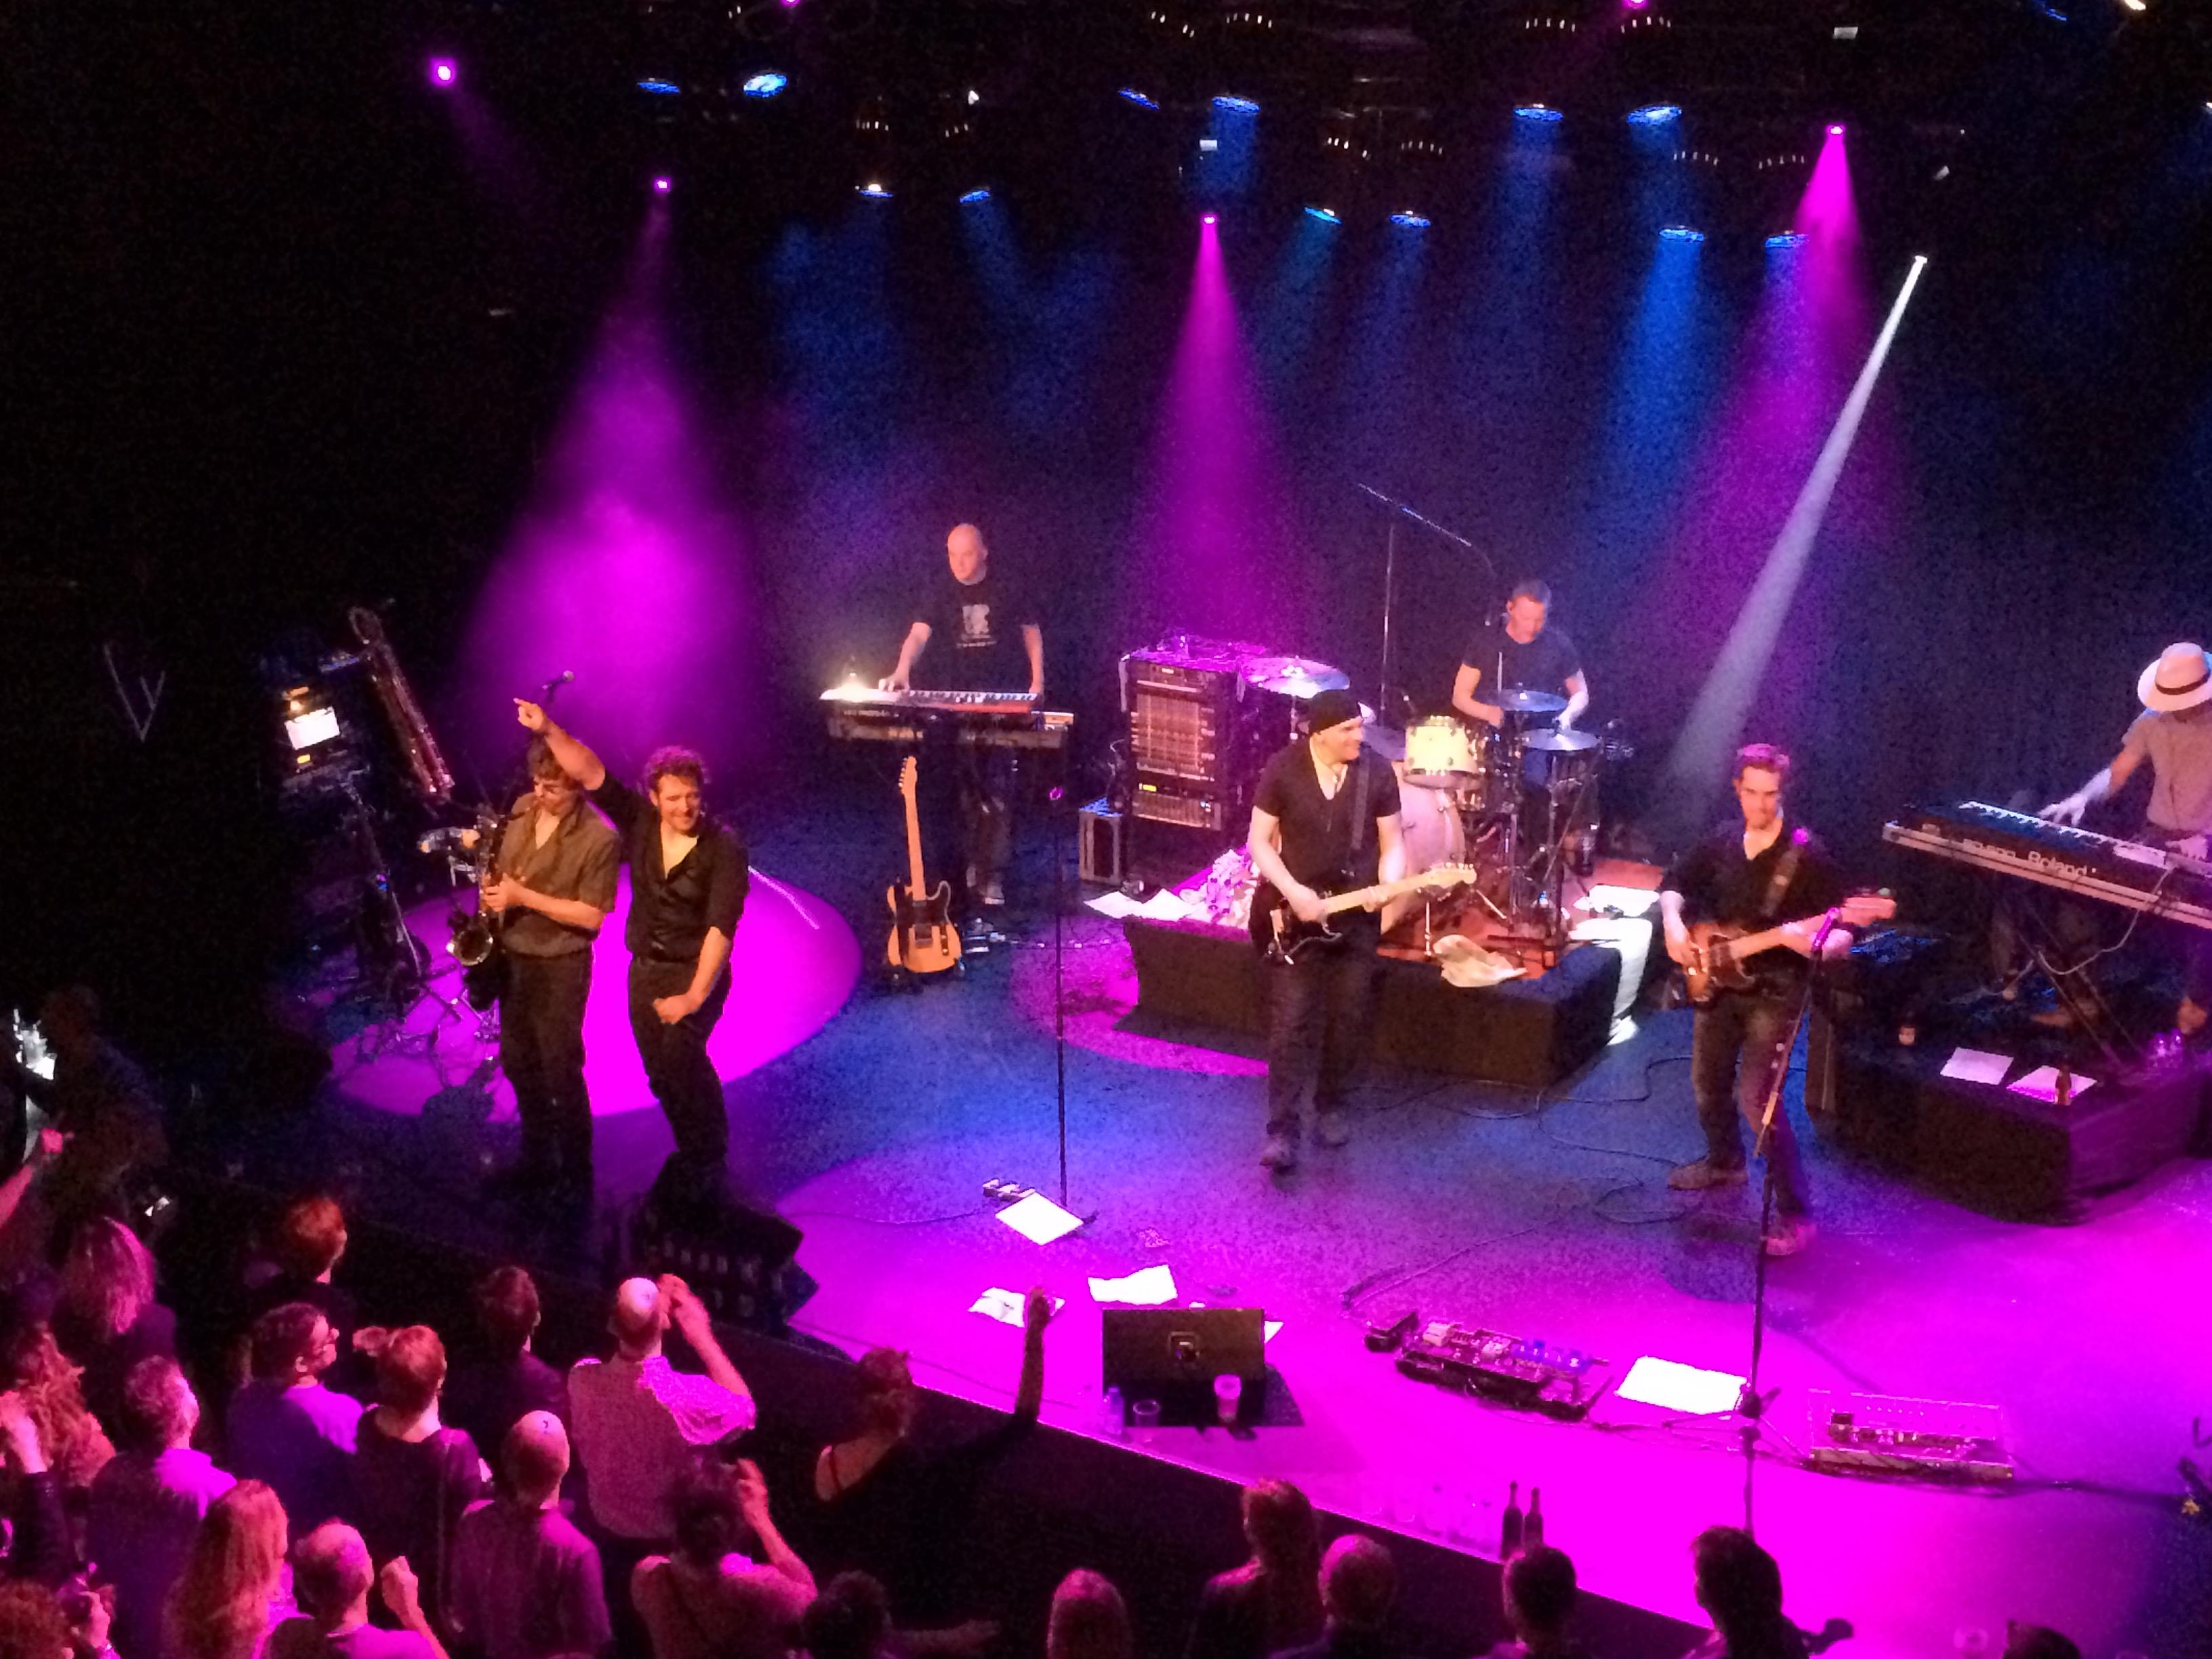 Concertreview: Bosstime in Hengelo